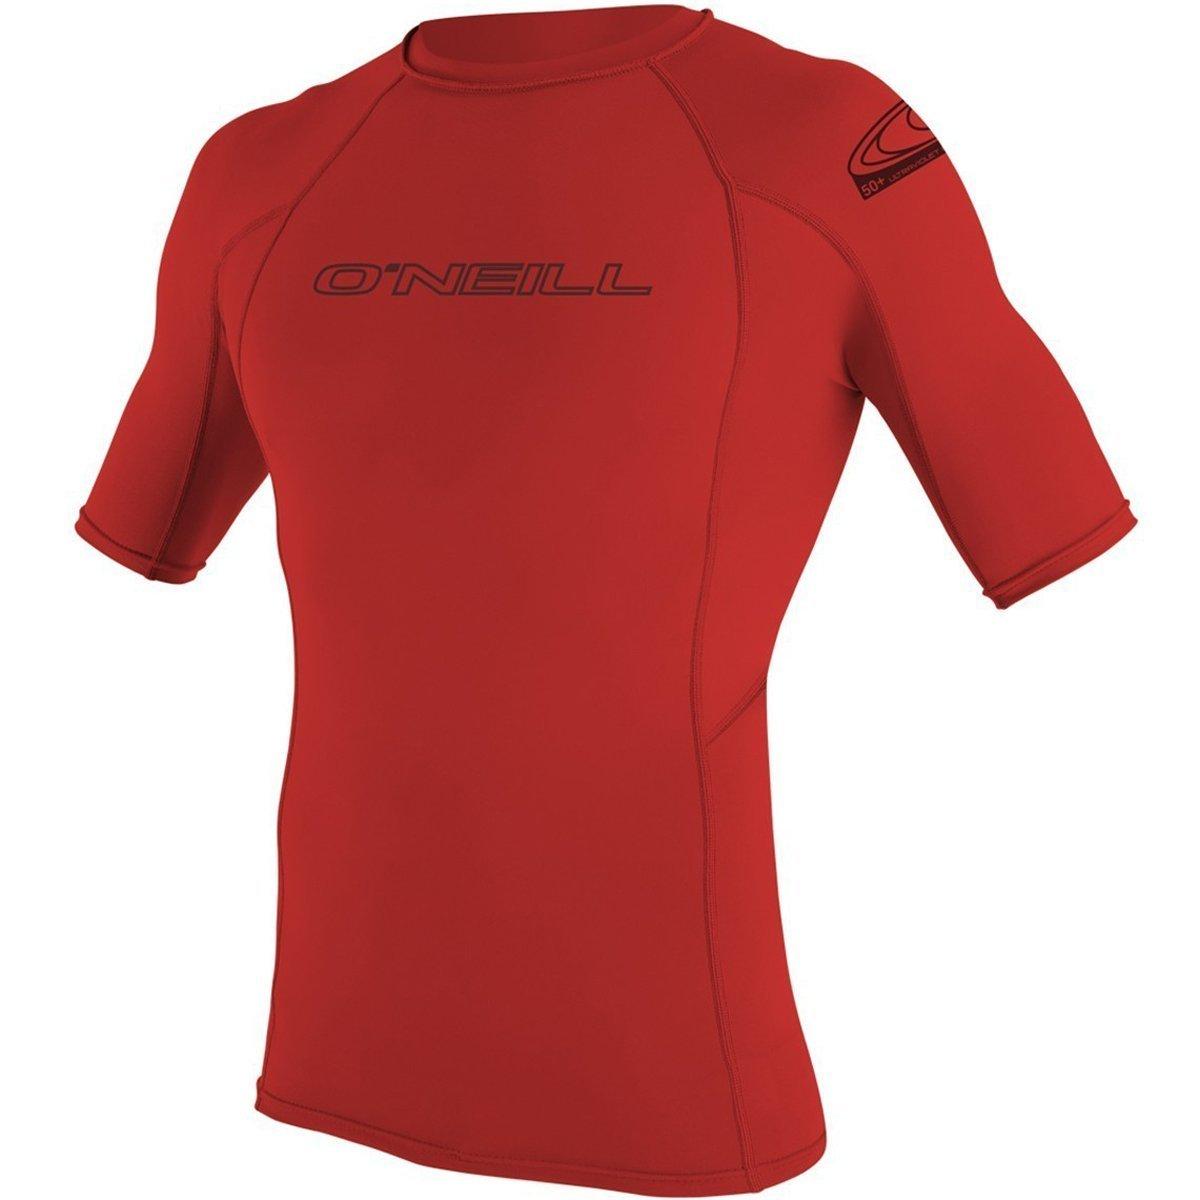 O'Neill  Men's Basic Skins UPF 50+ Short Sleeve Rash Guard, Red, Small